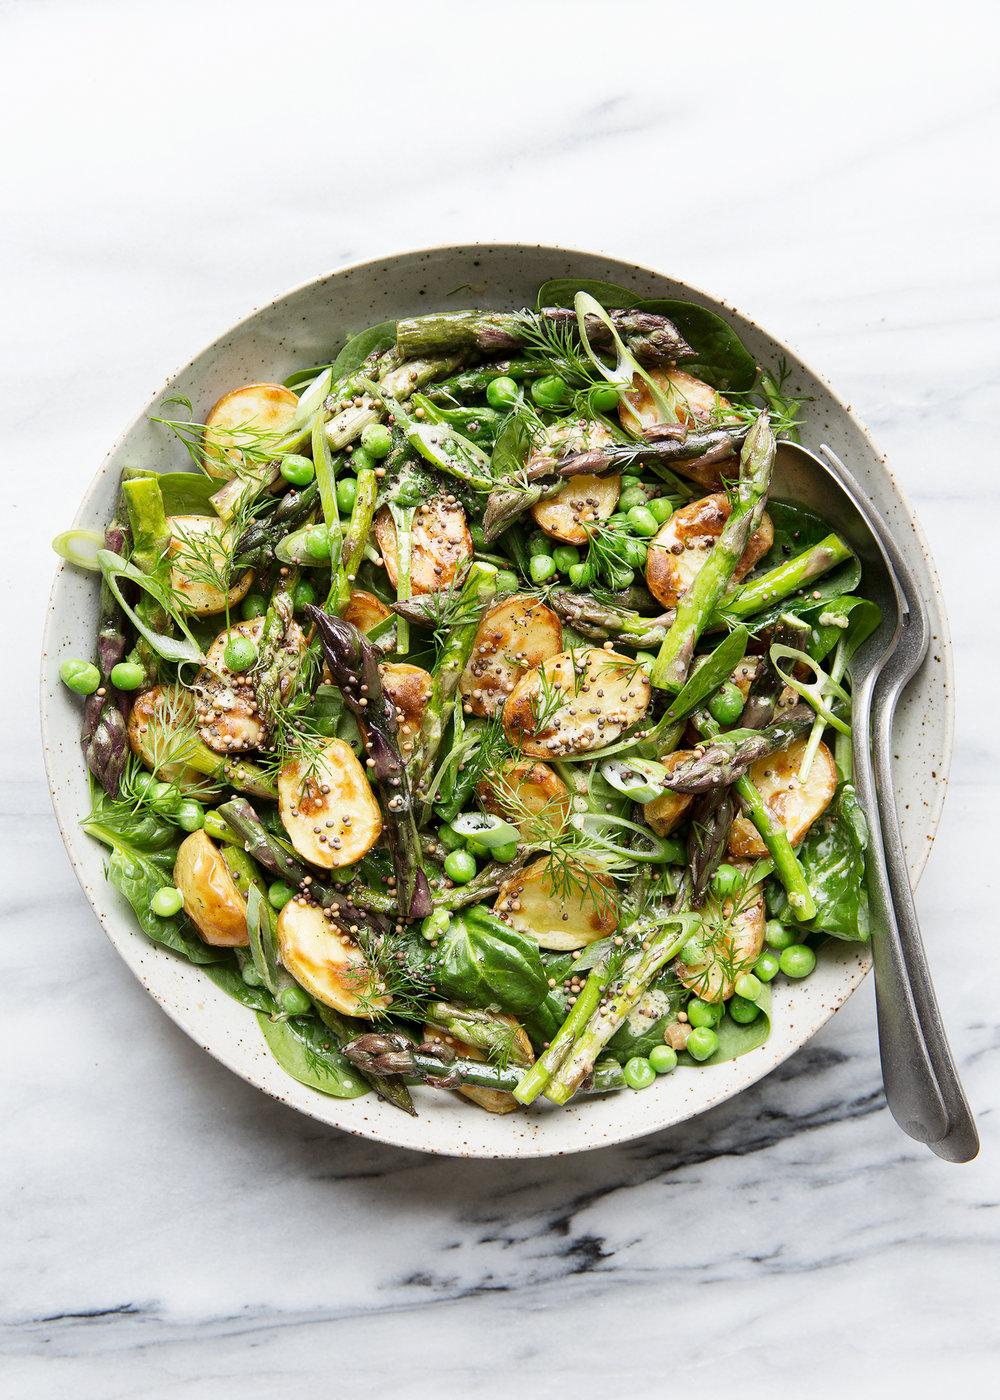 sonja_dahlgren_asparagus_potato_salad_1.jpg